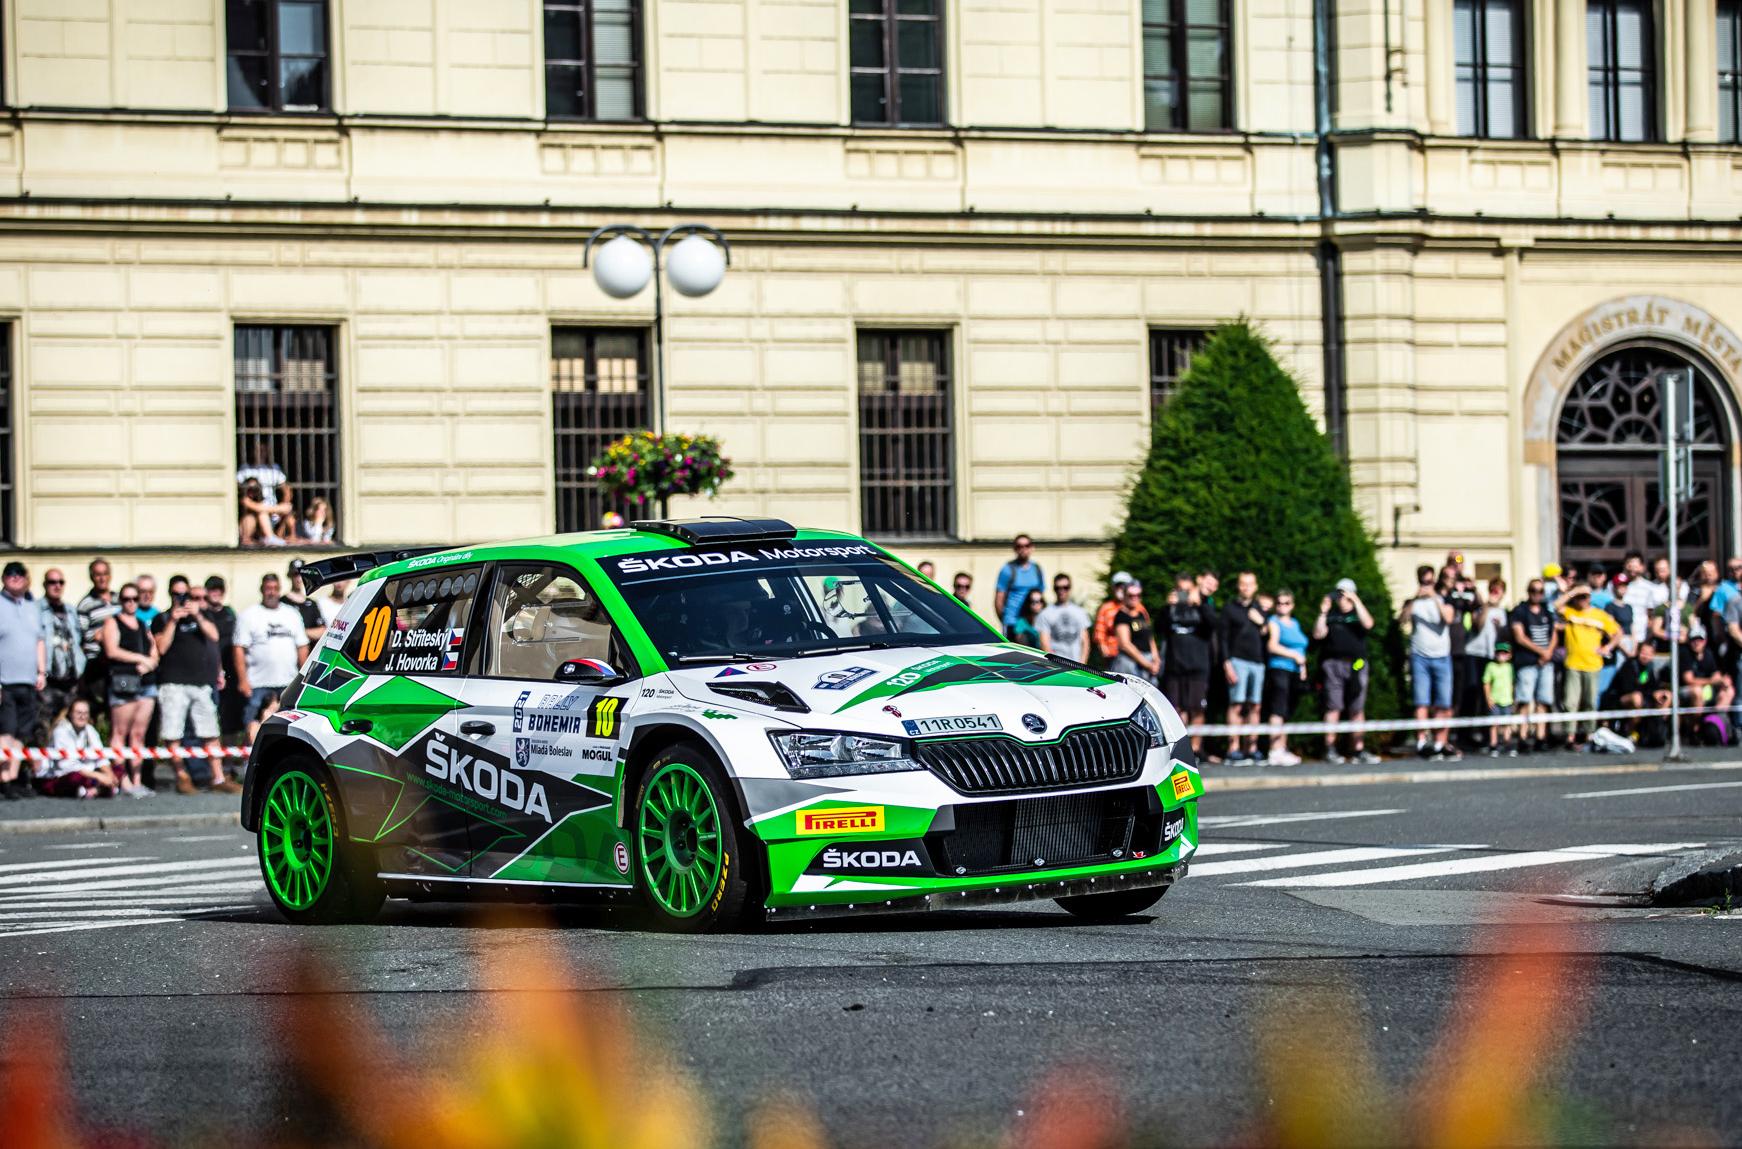 Jan Kopecký celebrates 120 years of SKODA in motorsport with ninth victory at Bohemia Rally - Image 3